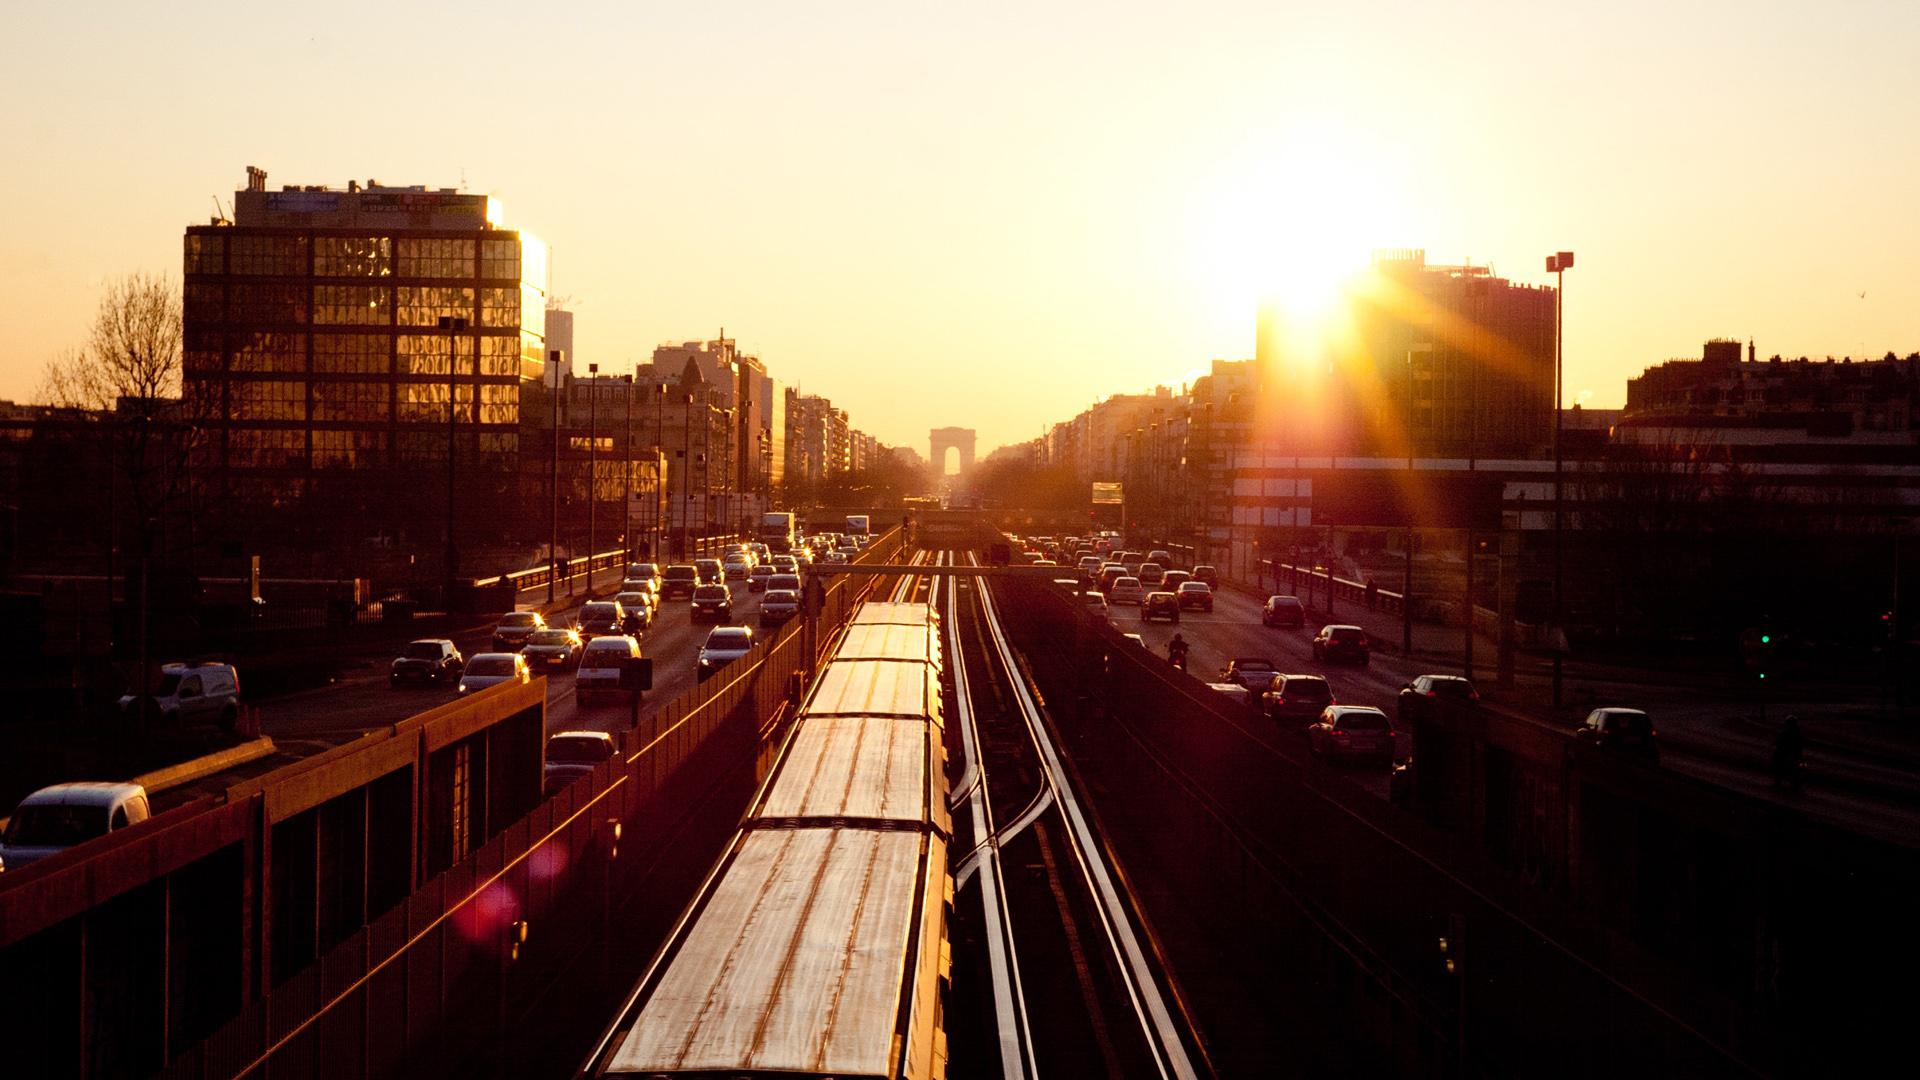 metro and traffic